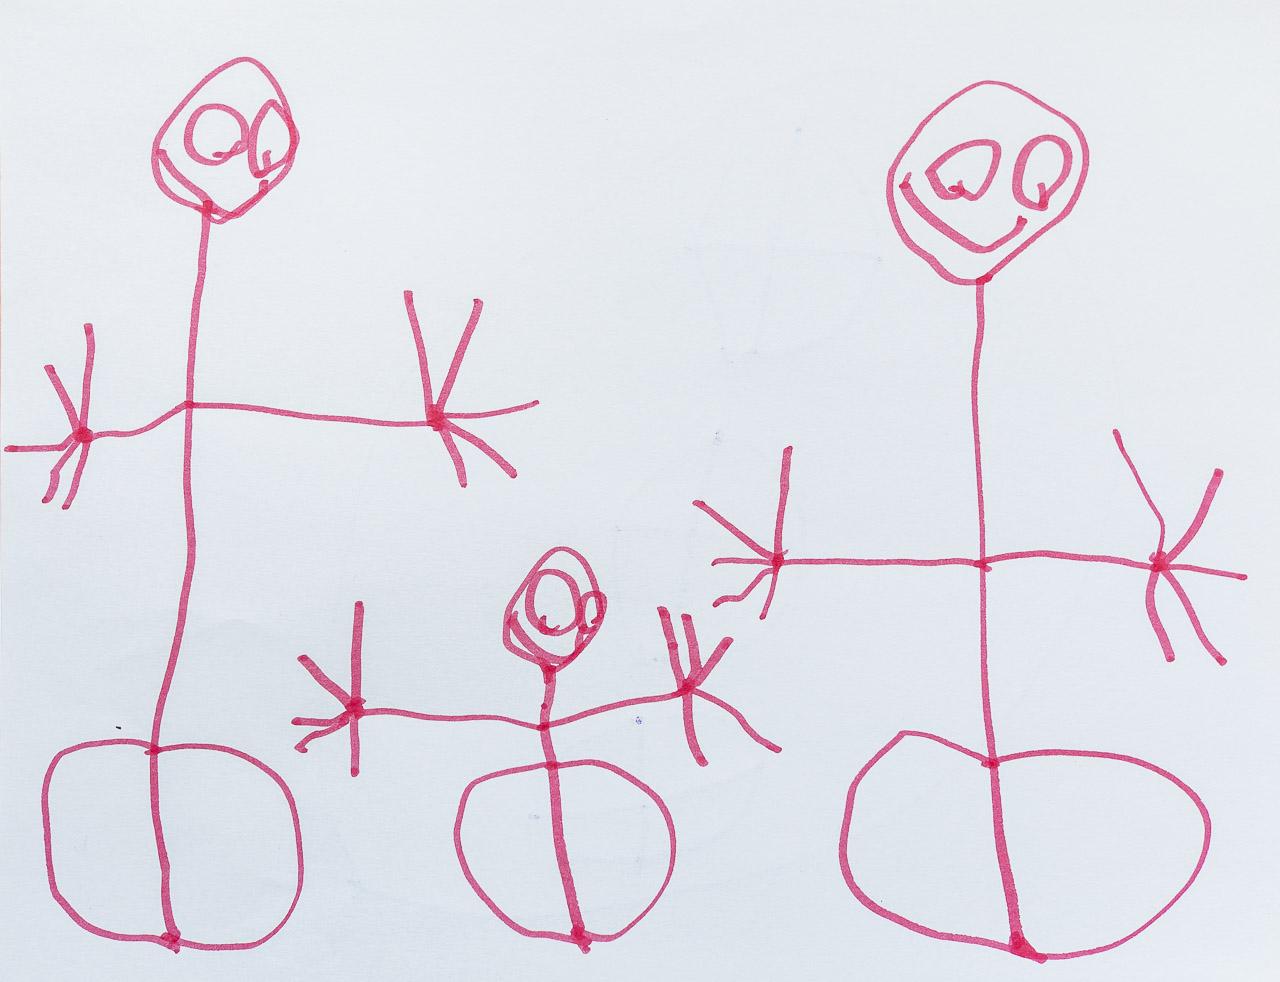 'stick family portrait' • montréal © marc montebello all rights reserved